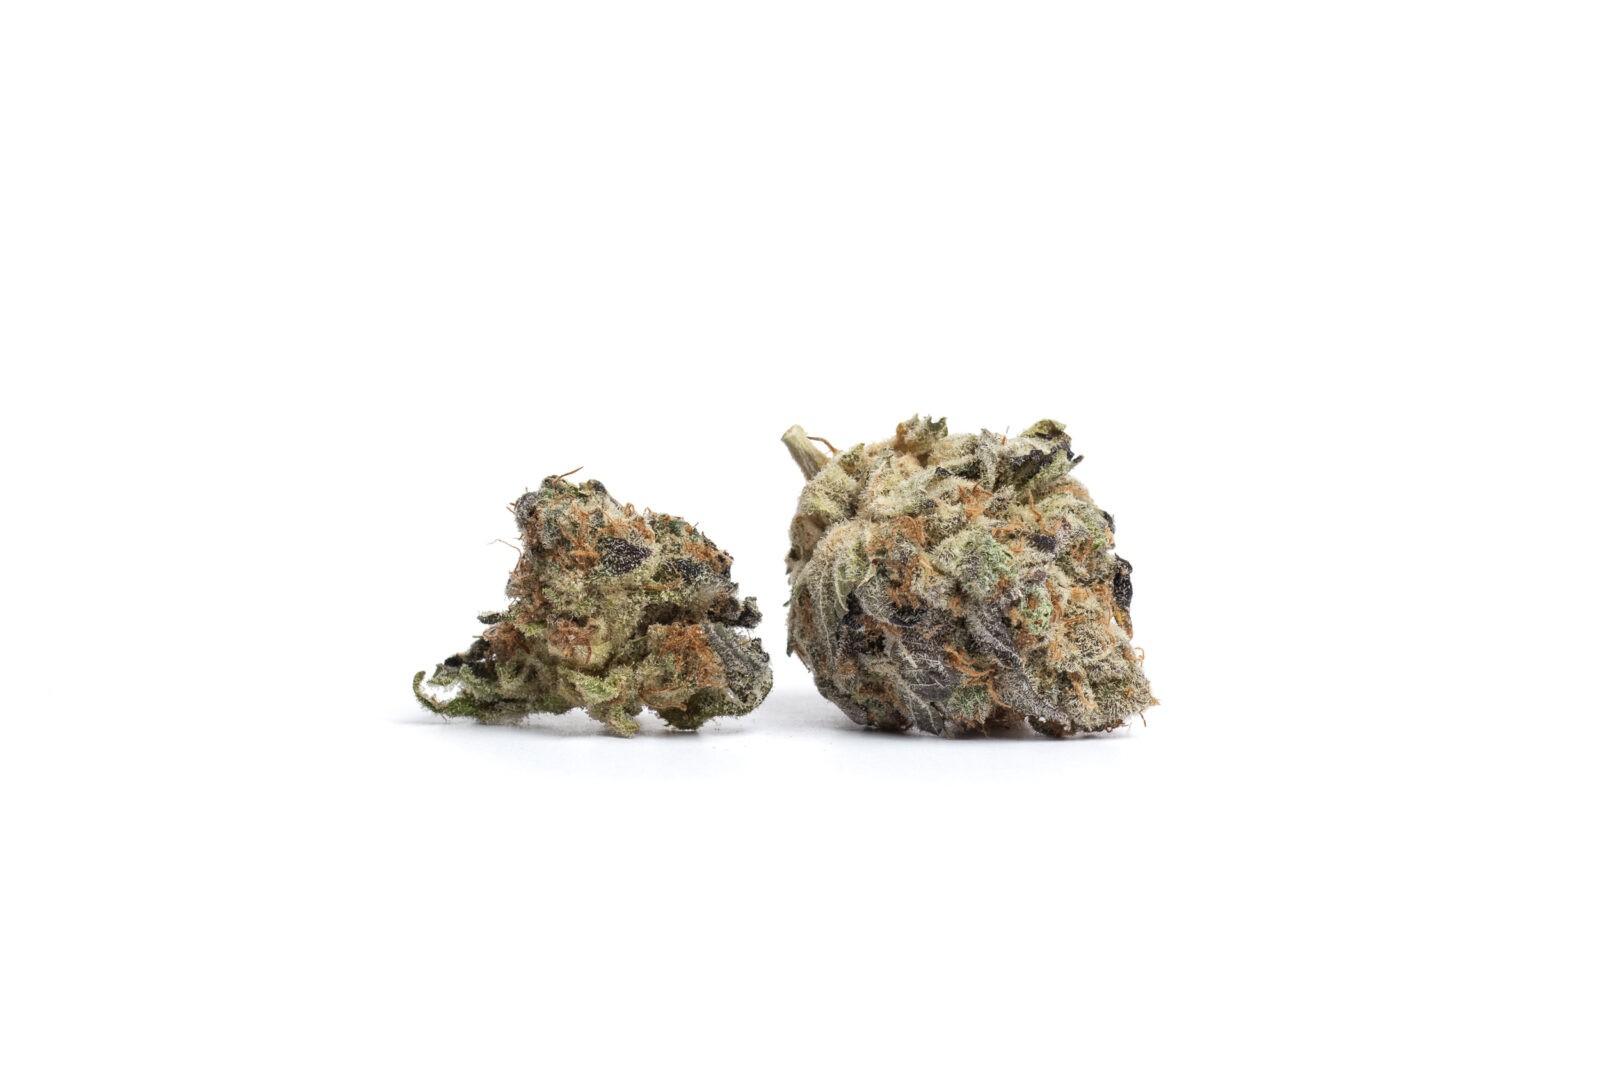 CannTrust cannabis edit seven 2018